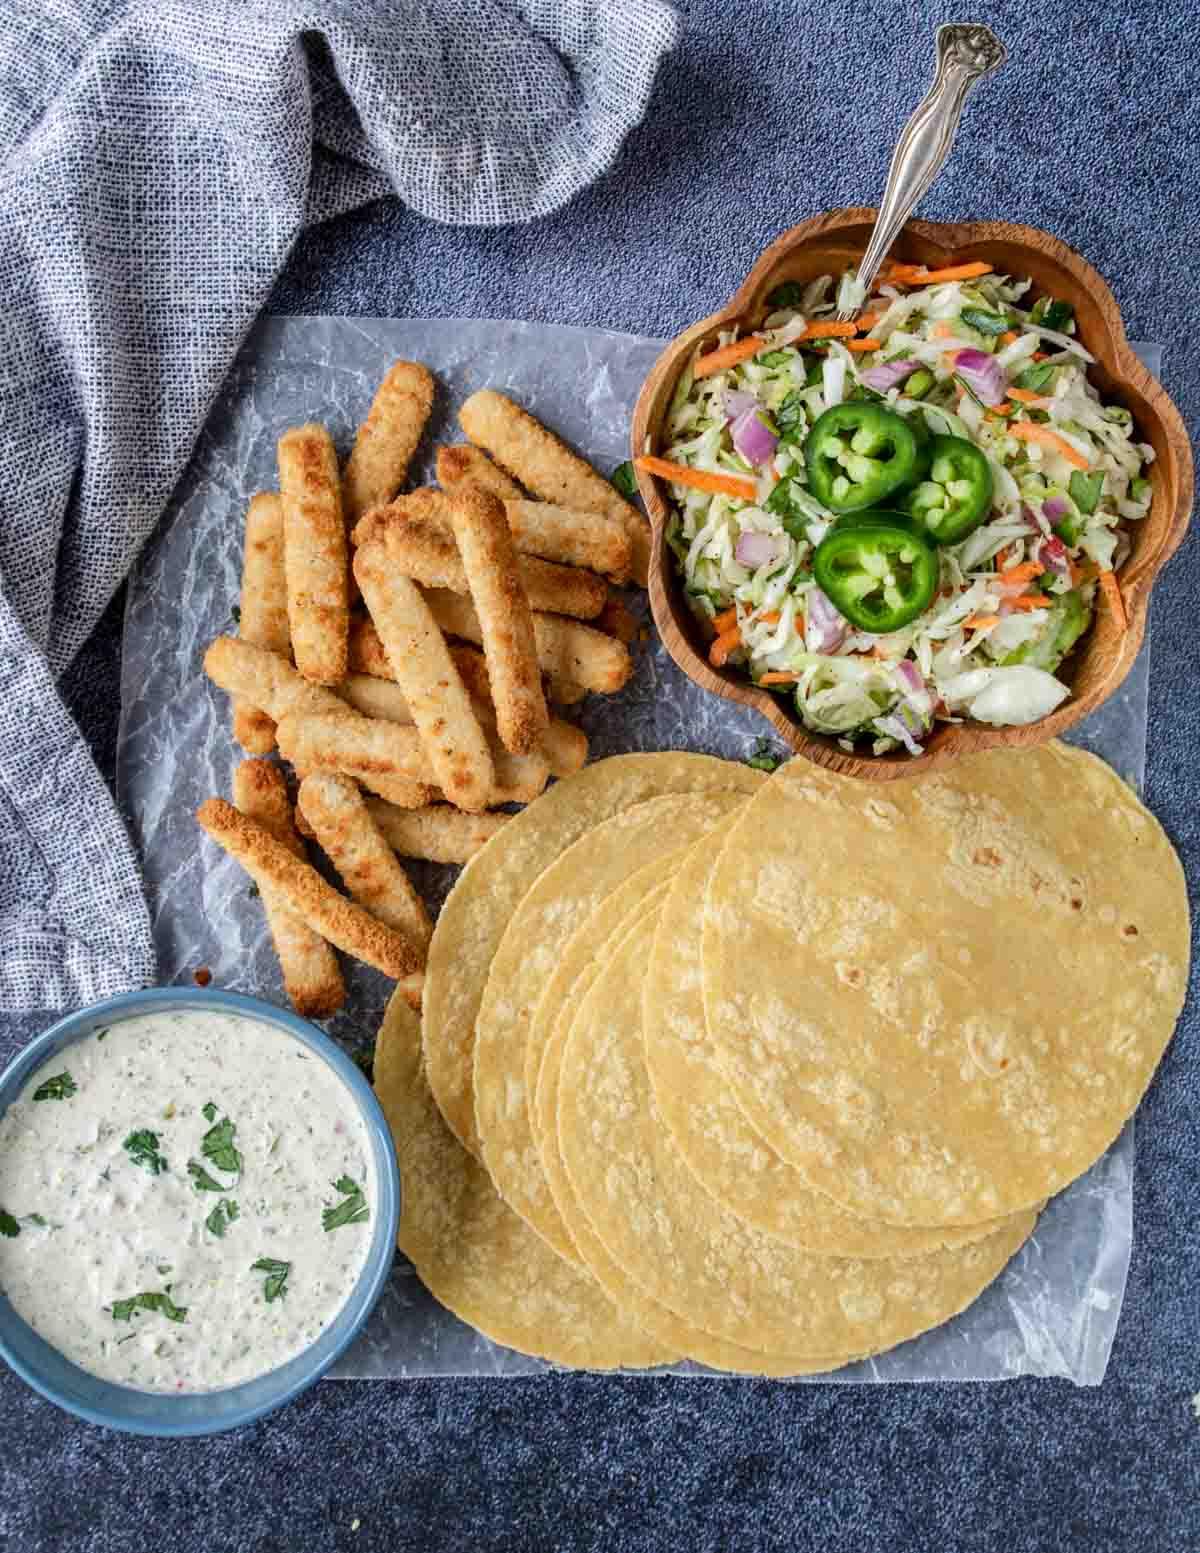 corn tortillas, fish sticks, slaw and tartar sauce